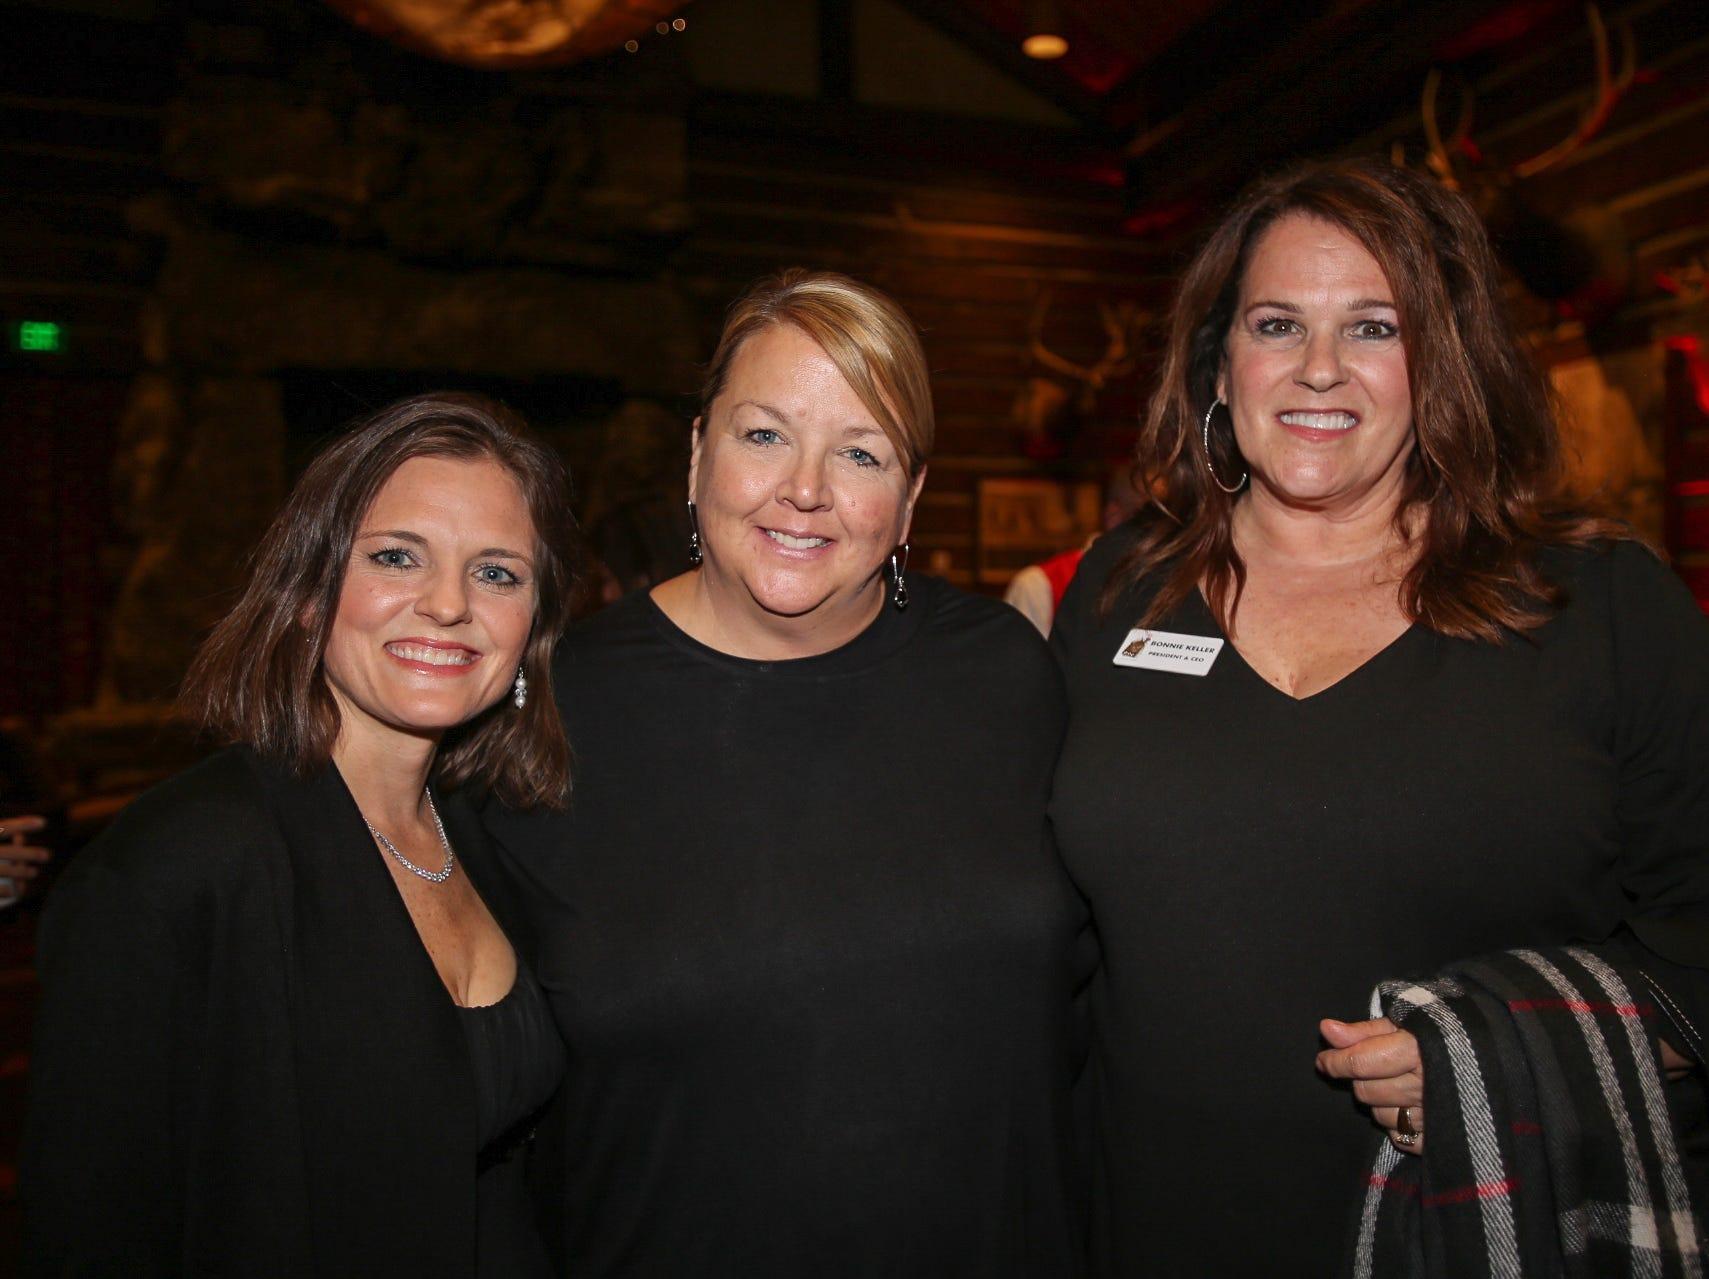 Mindy Munoz, Debbie Kinser, and Bonnie Keller